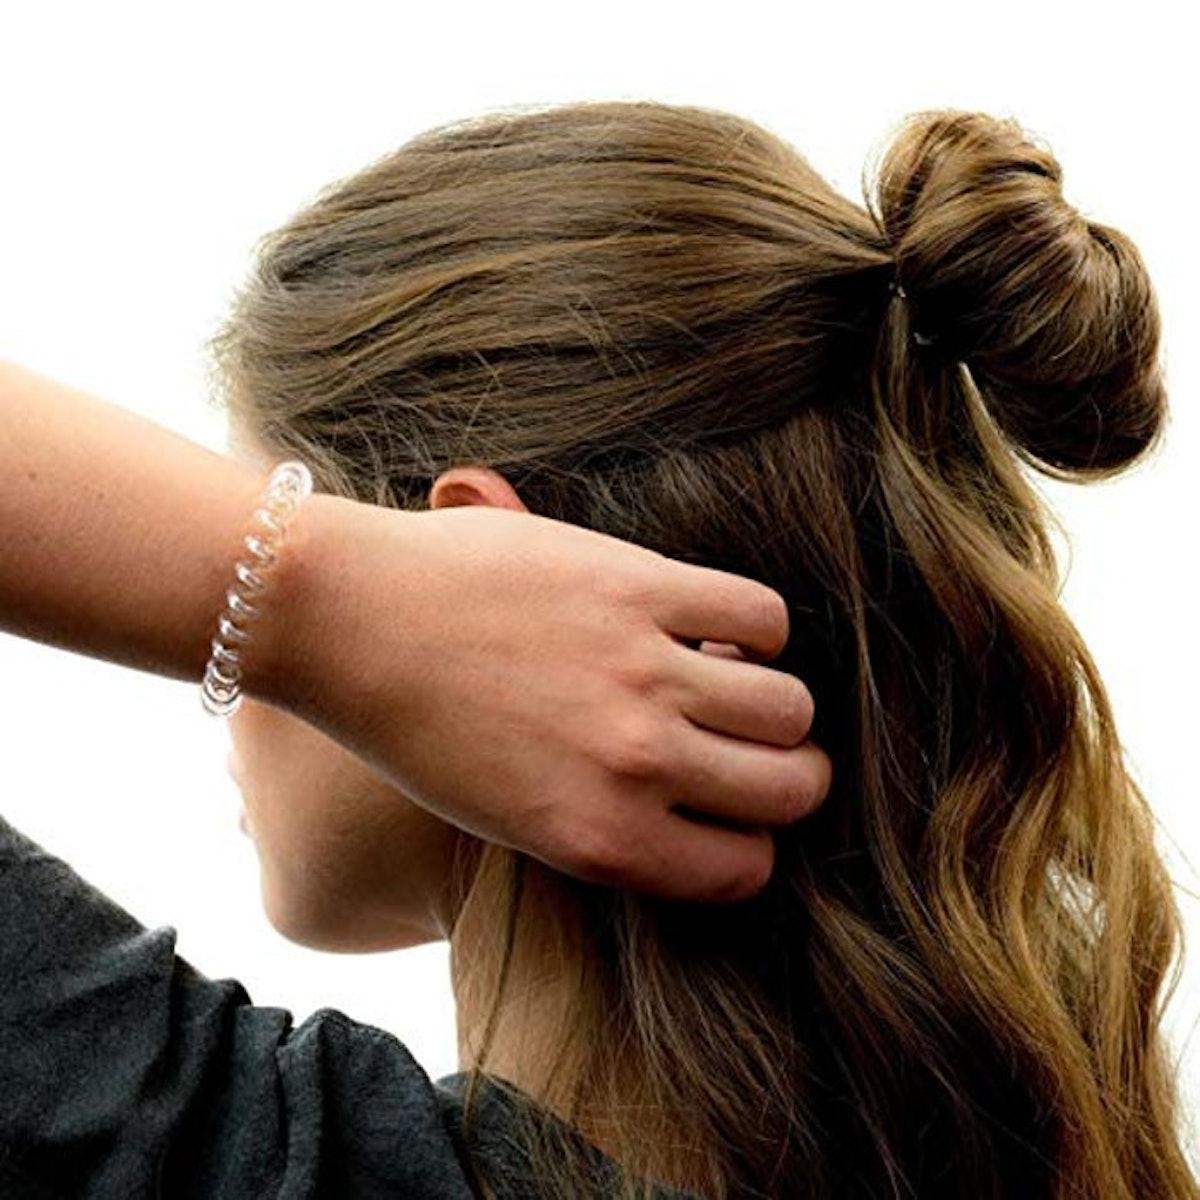 Kitsch Clear Coil Hair Ties (4-Pack)